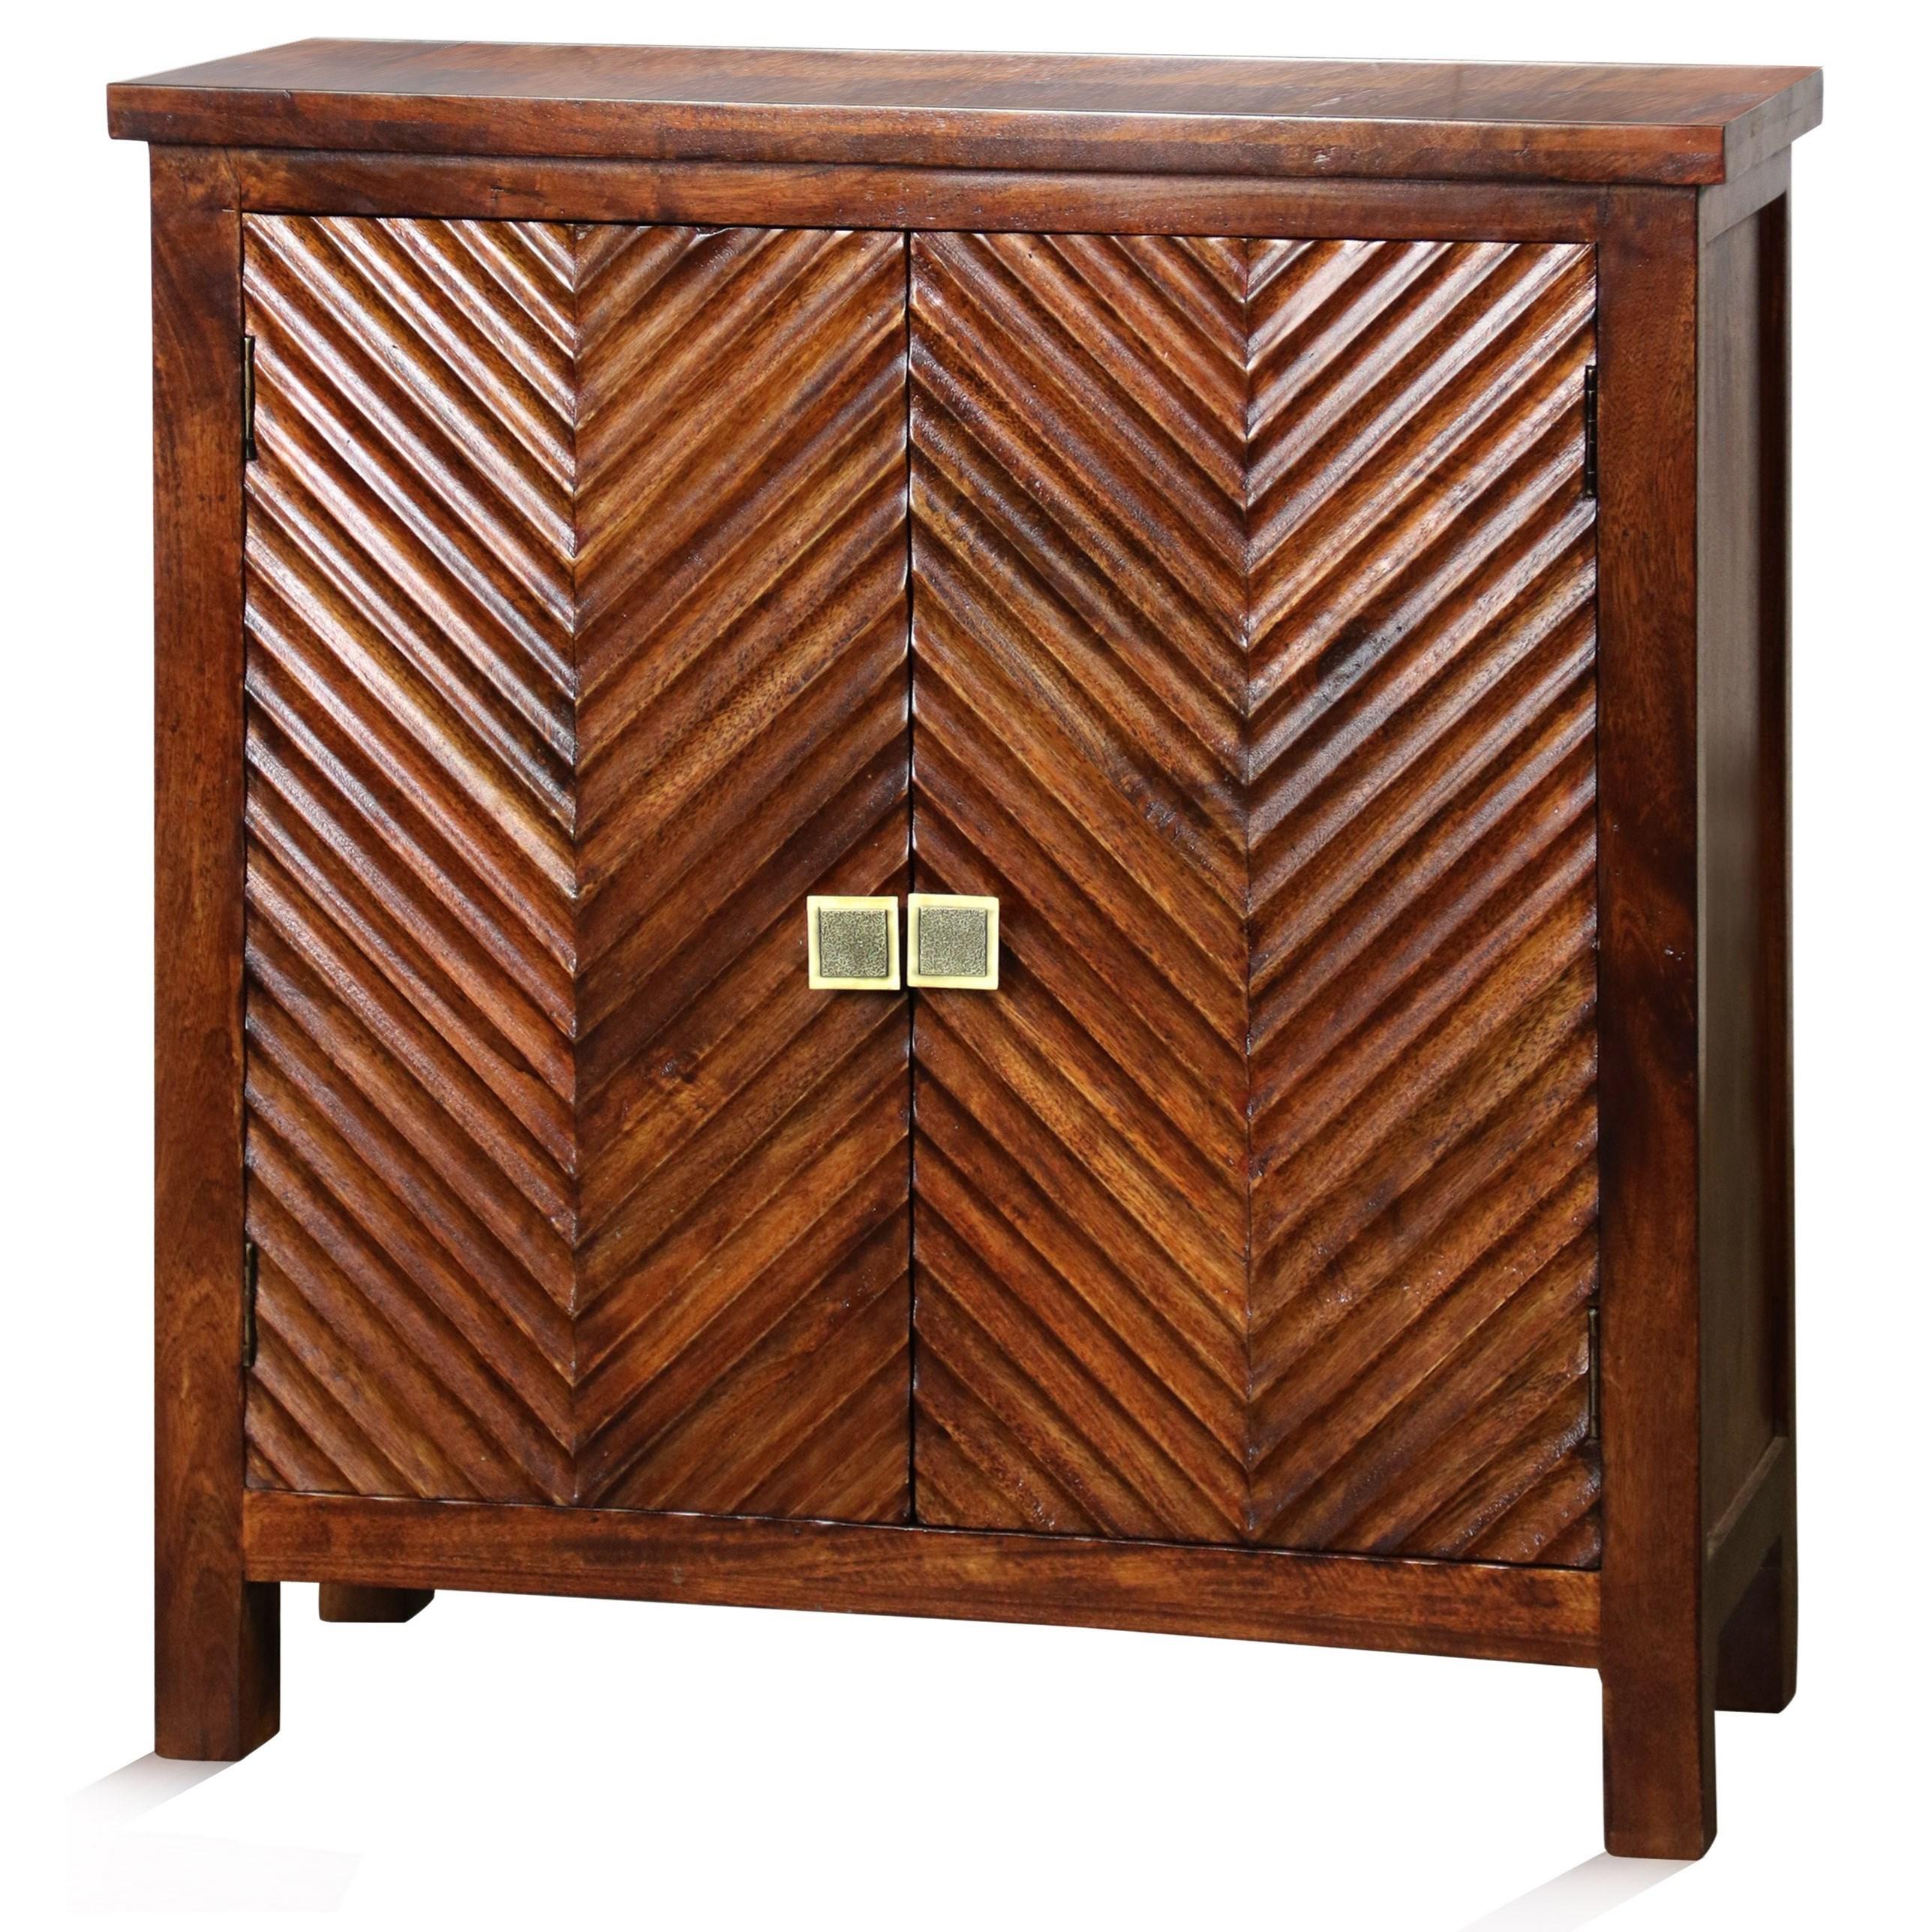 StyleCraft Occasional Cabinets2 Door Cabinet